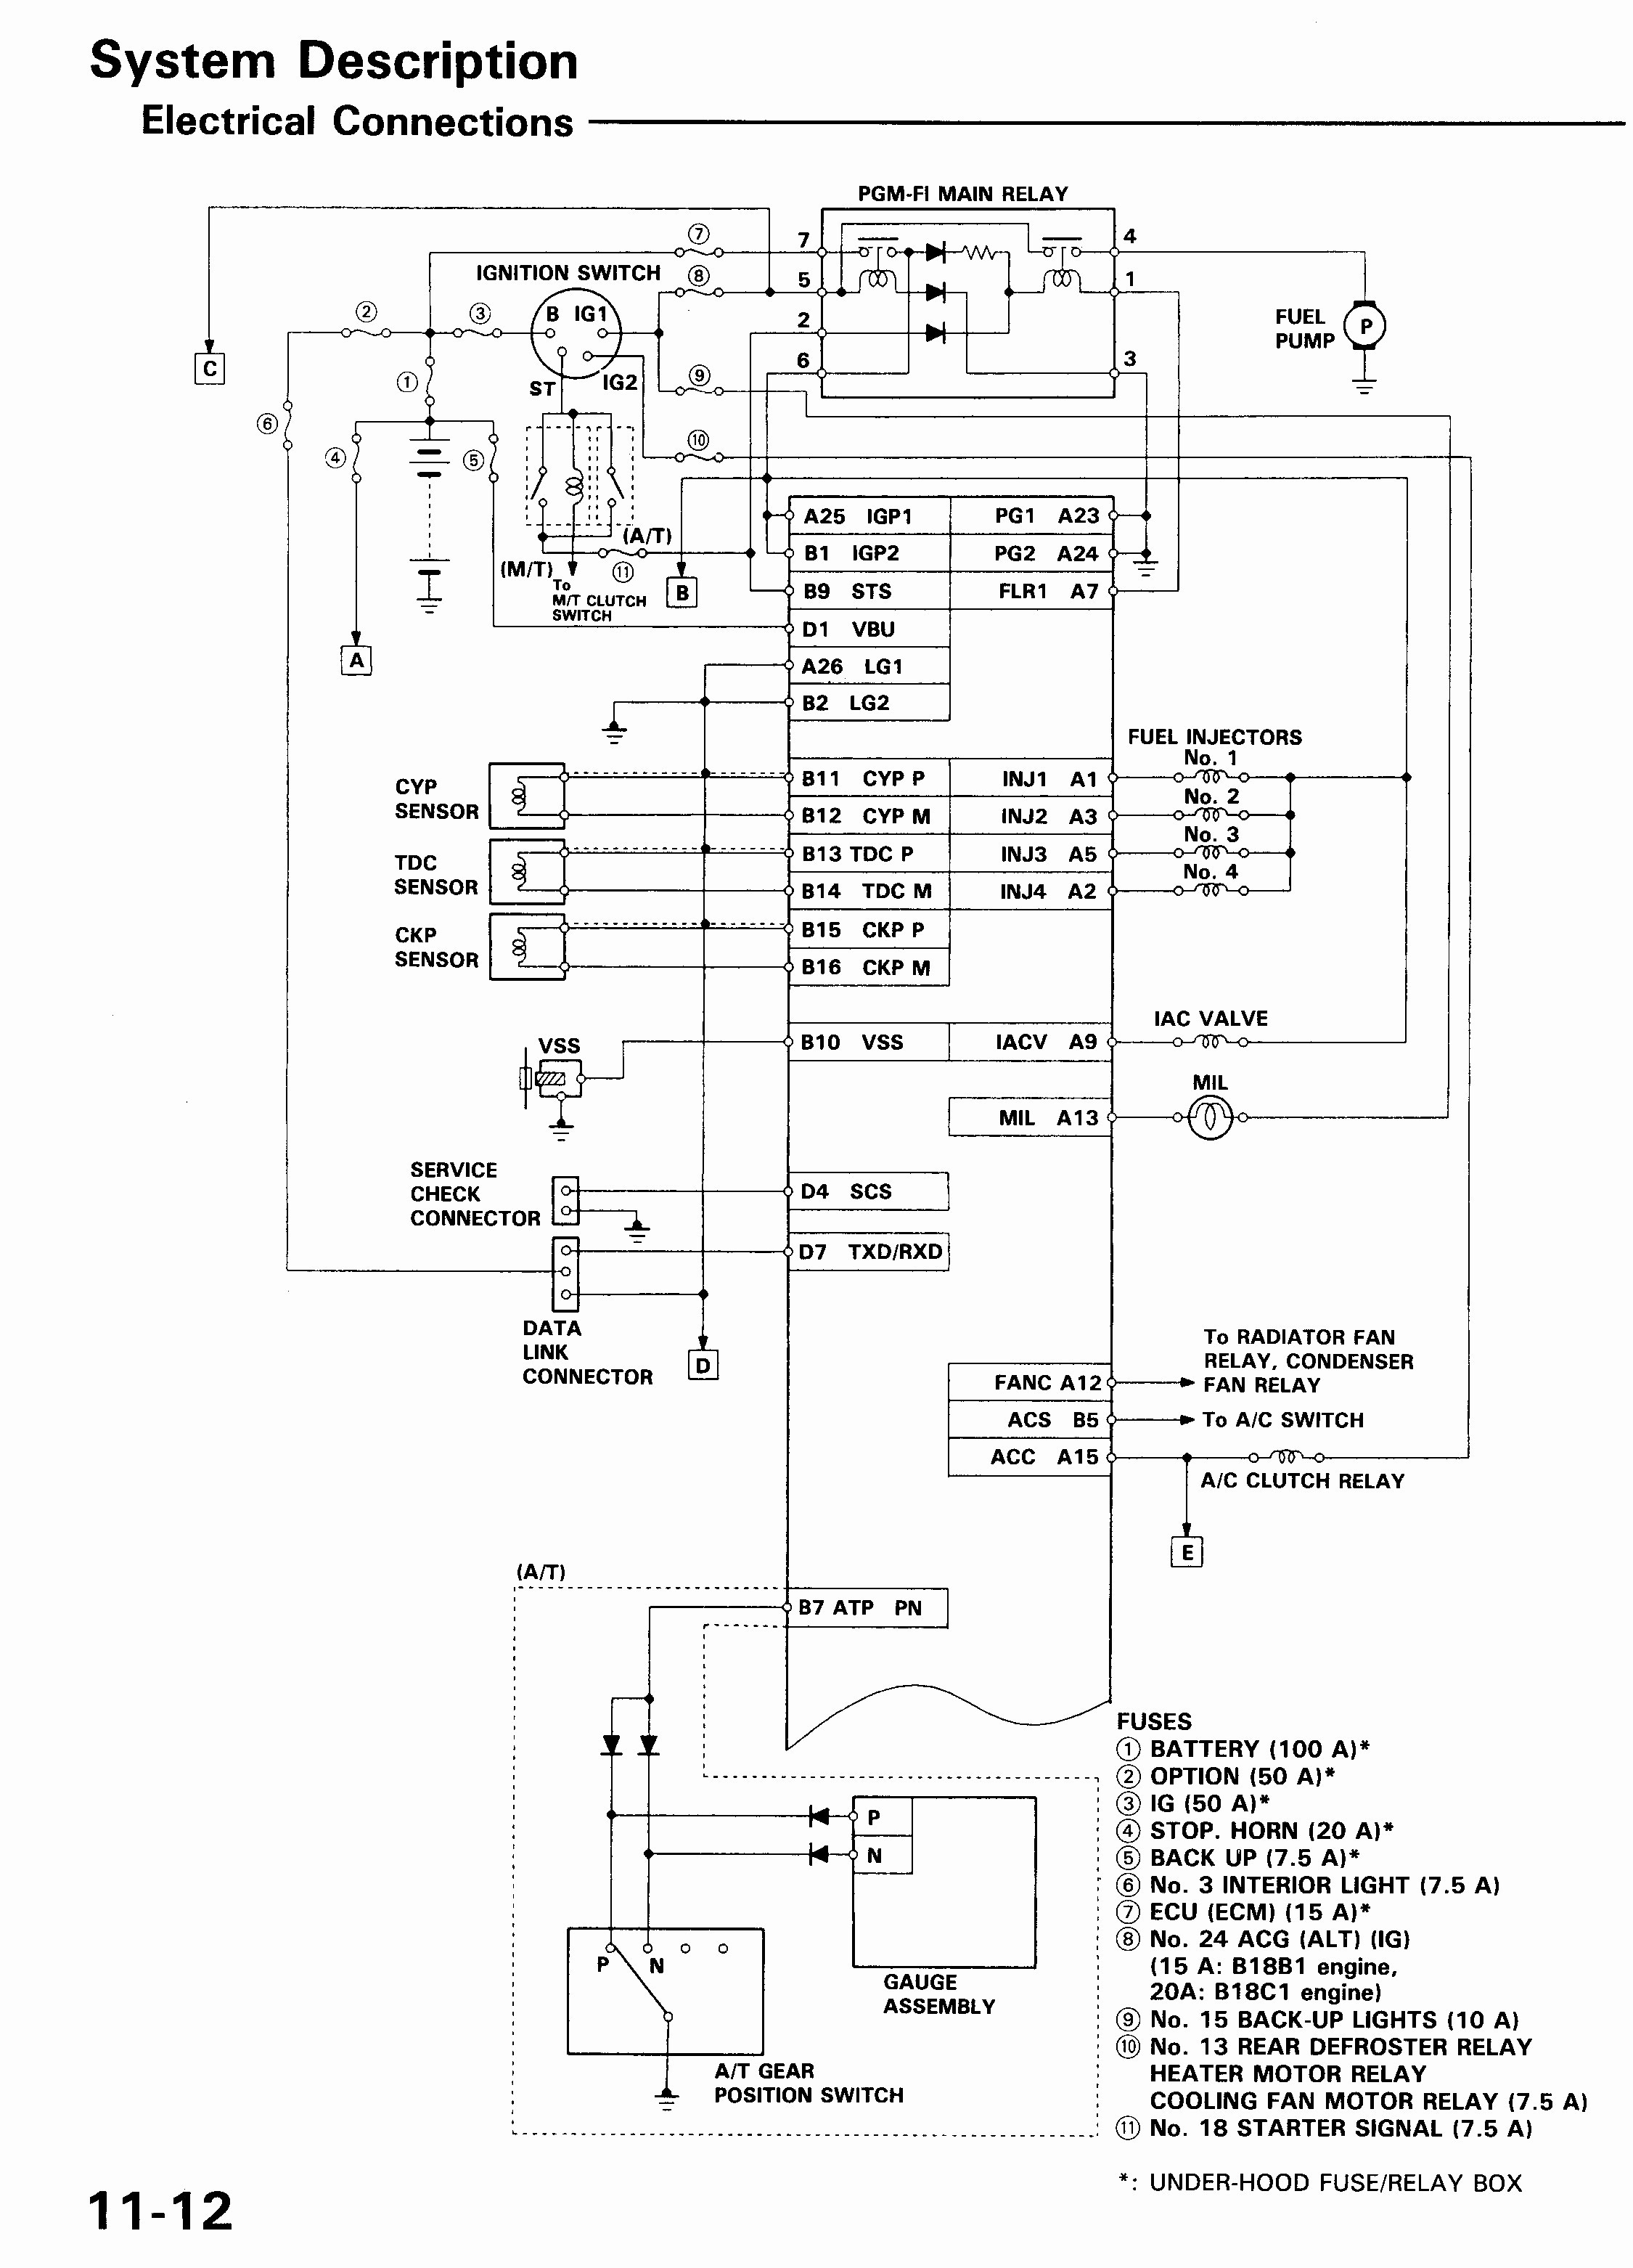 Elegant honda civic wiring diagram wiring diagram image on honda thermostat  diagram jpg 2250x3124 2001 honda